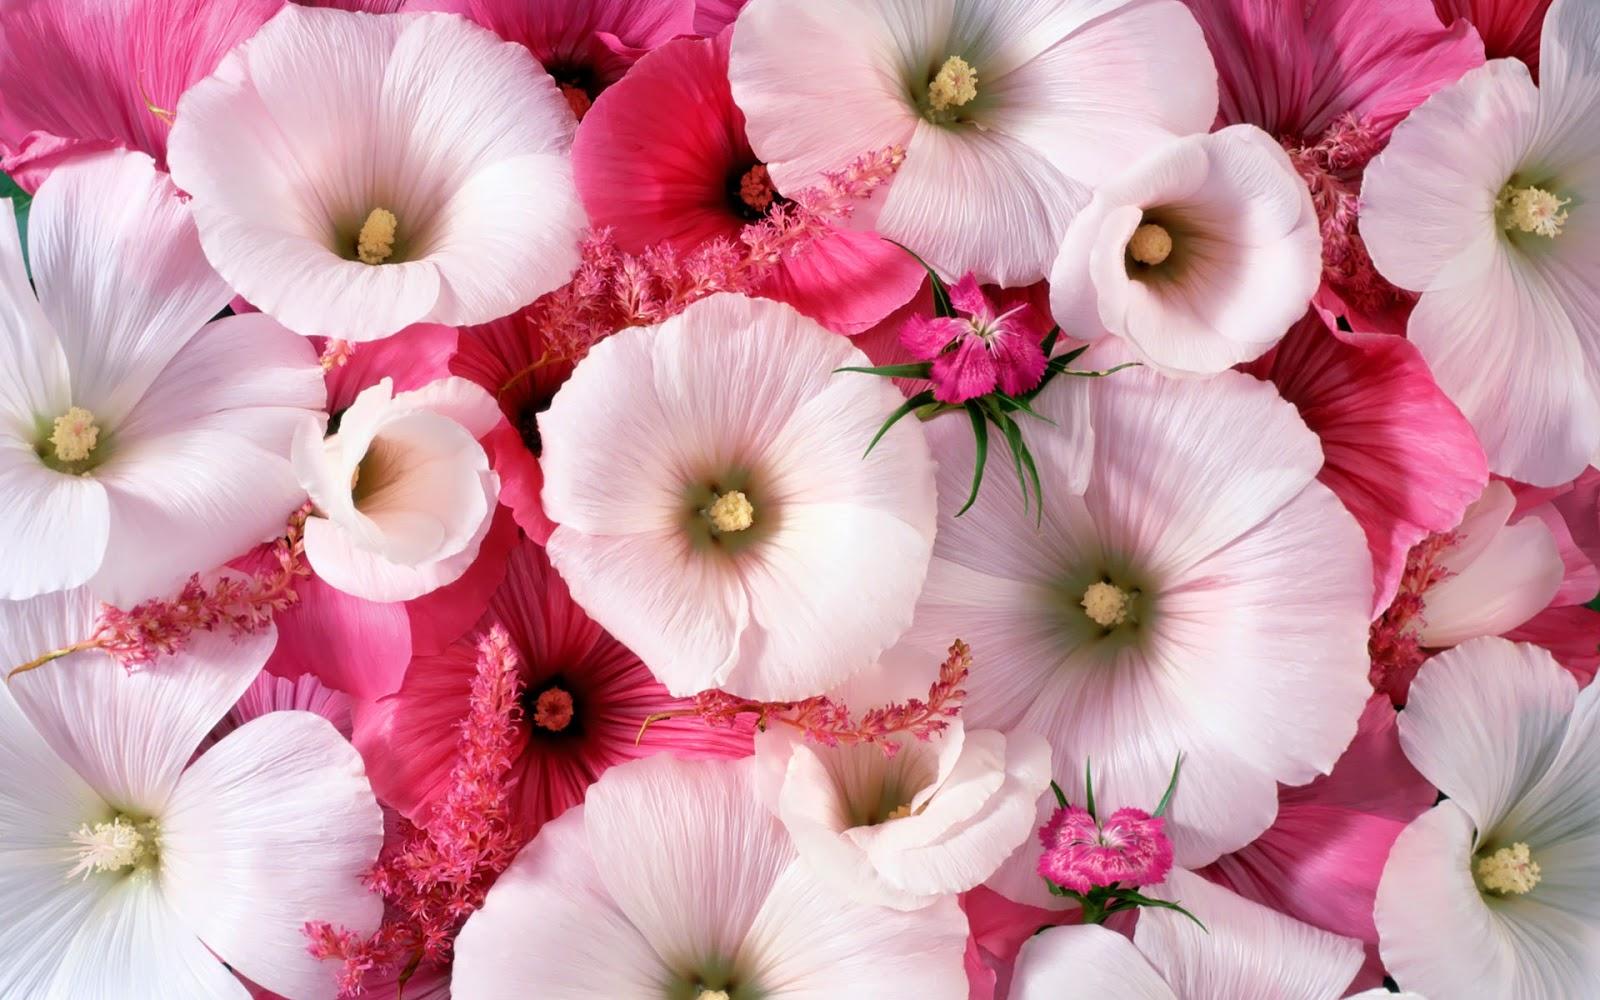 White pink red flowers desktop wallpapers desktop wallpaper white pink red flowers wallpaper mightylinksfo